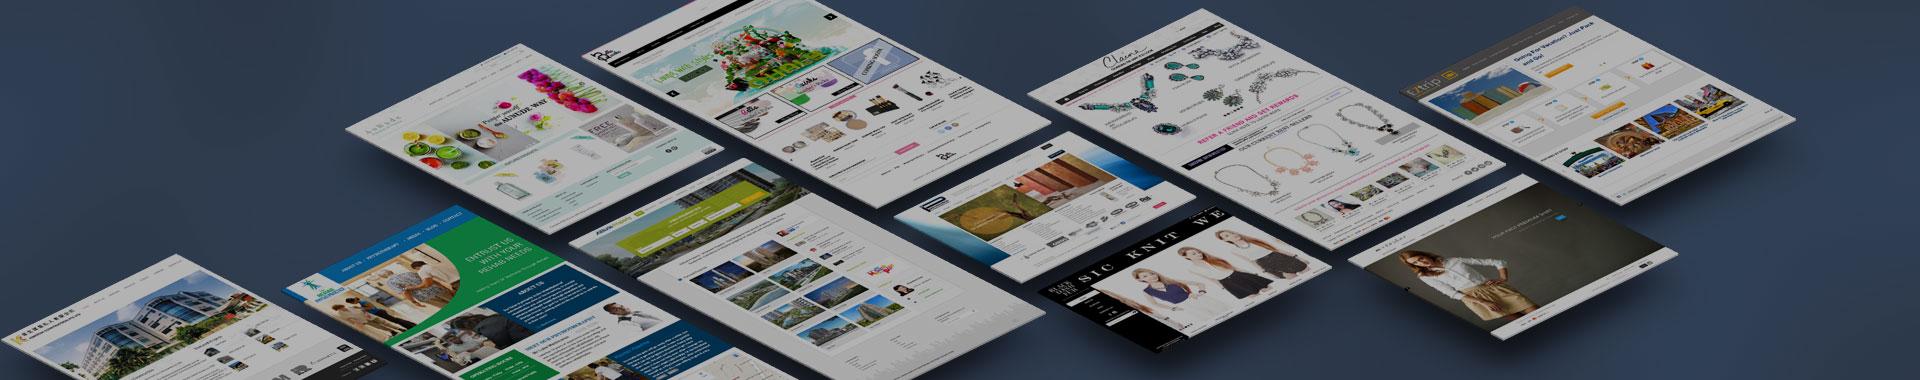 Website Design Singapore - Halo Lifestyle Gallery